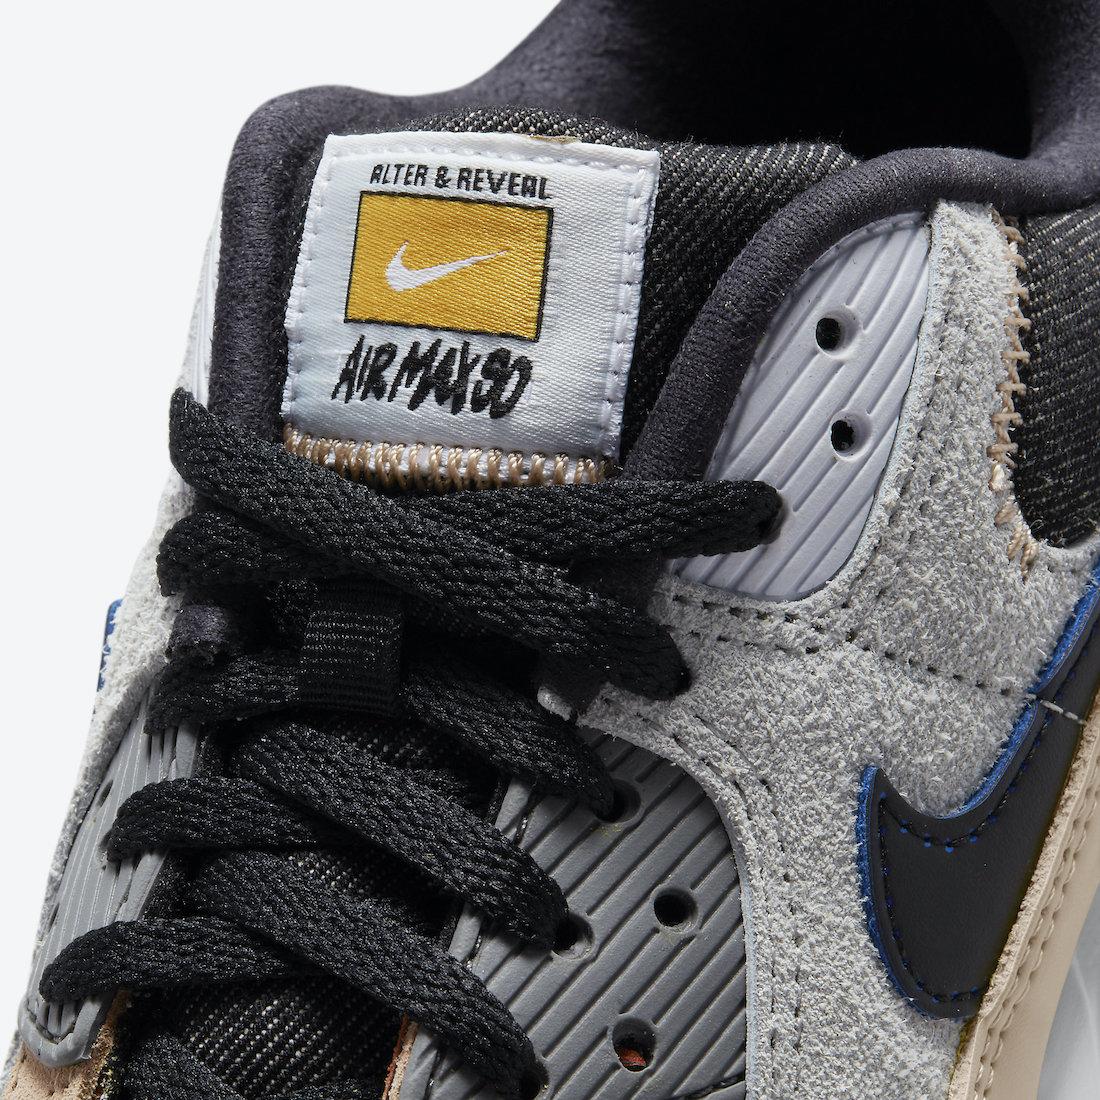 Nike Air Max 90 GS, Nike Air Max 90, Nike Air Max, Nike Air, NIKE, Air Max 90, Air Max